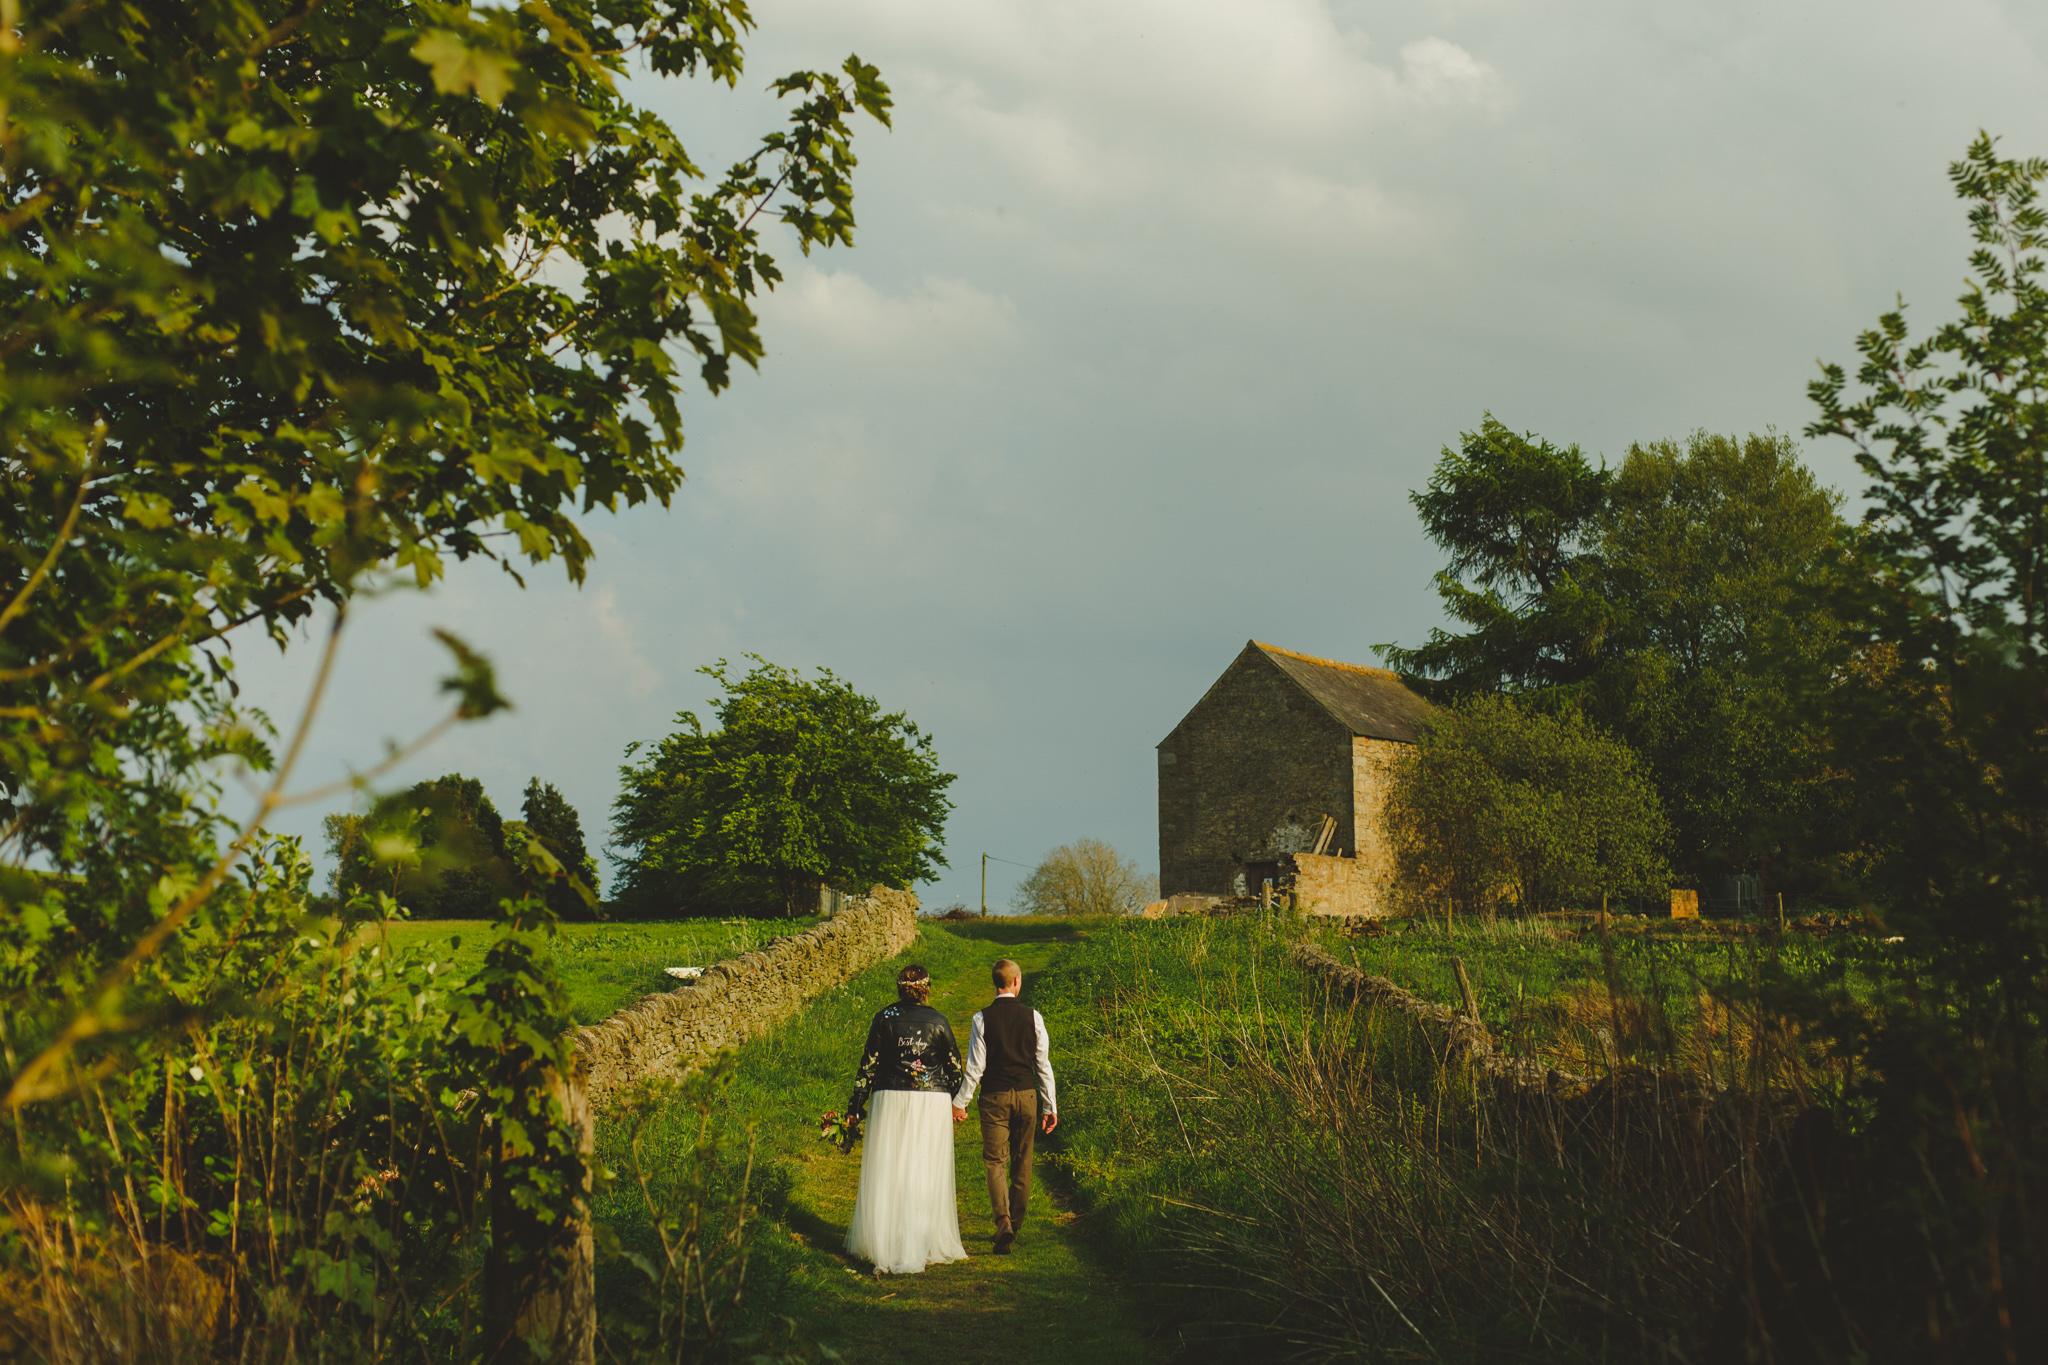 derbyshire-wedding-photographer-videographer-camera-hannah-13.jpg